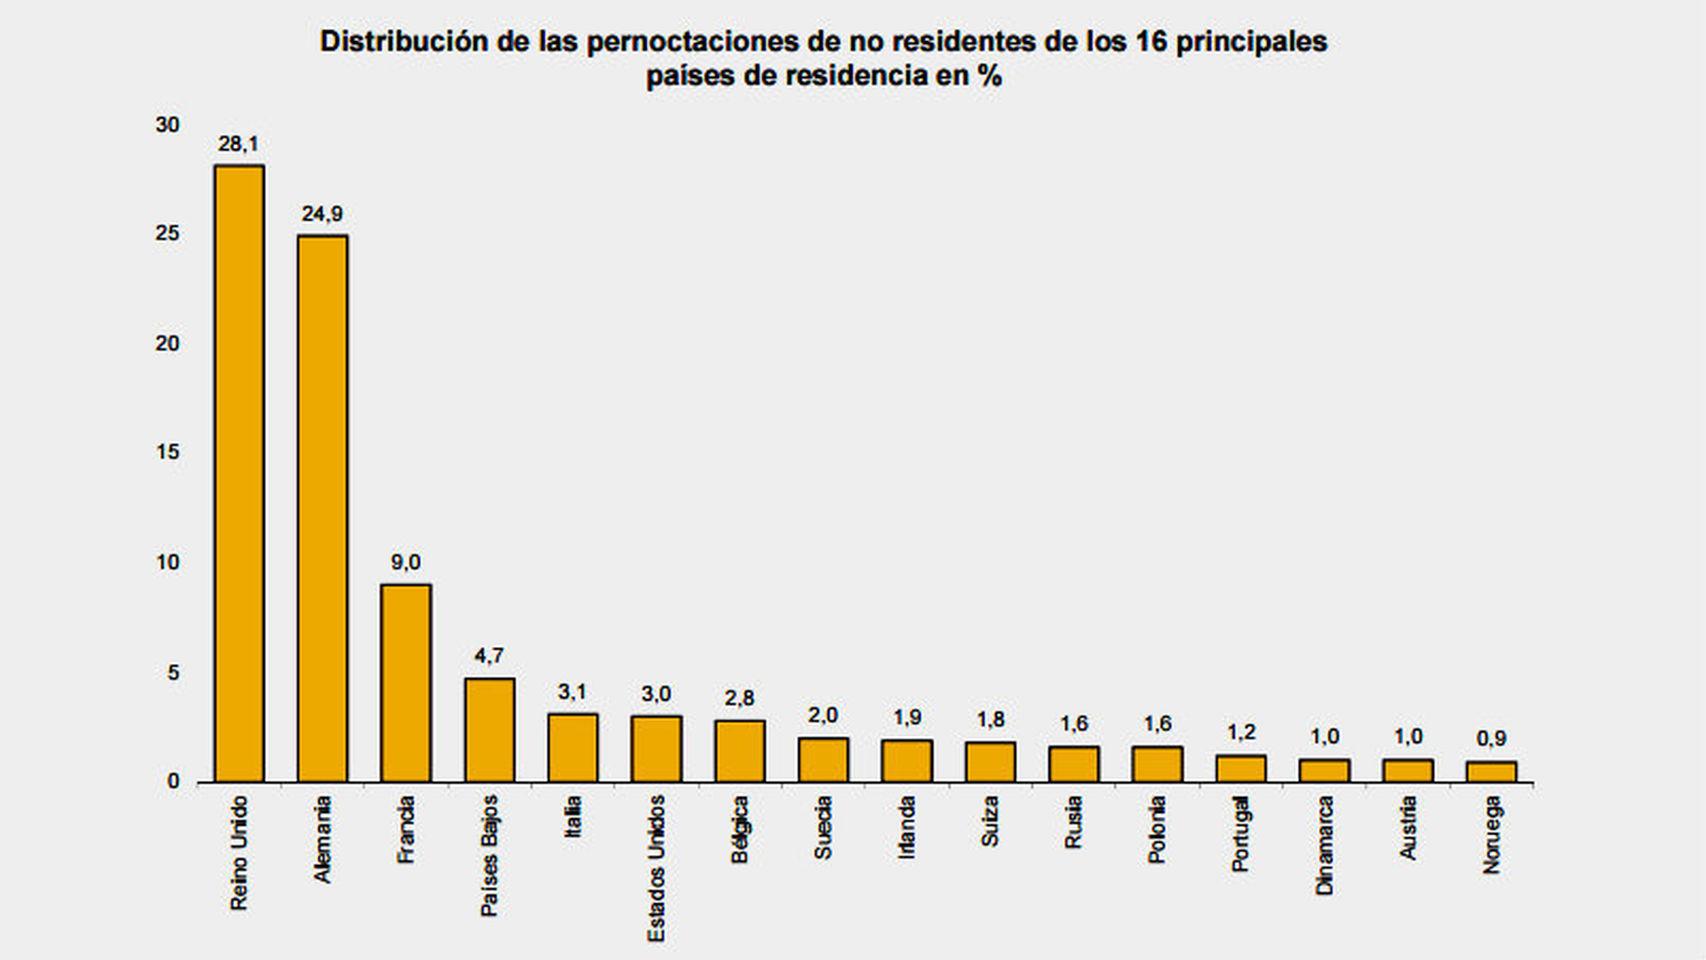 grafico-temblar-turismo-Espana-brexit_134747506_7826399_1706x960